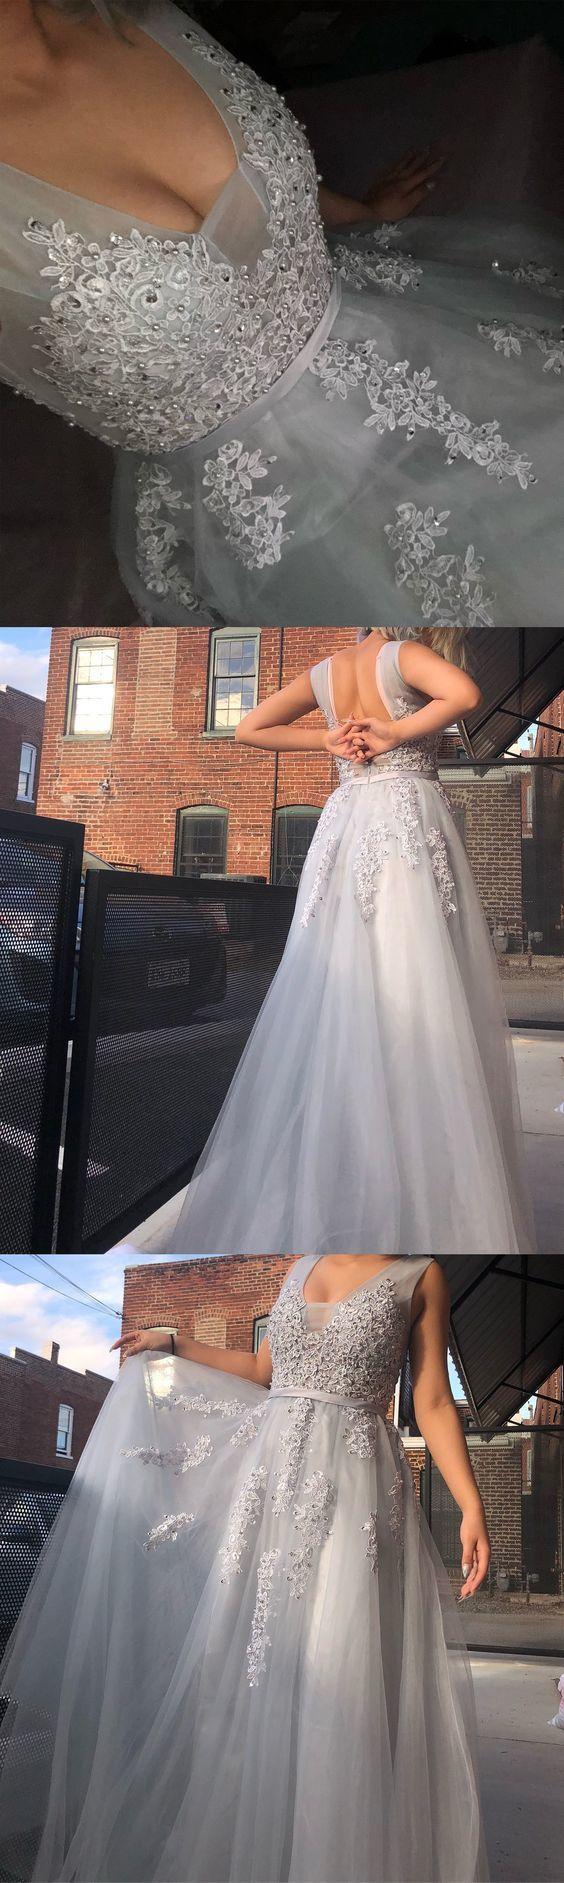 Aline vneck backless light blue tulle appliques prom dress with